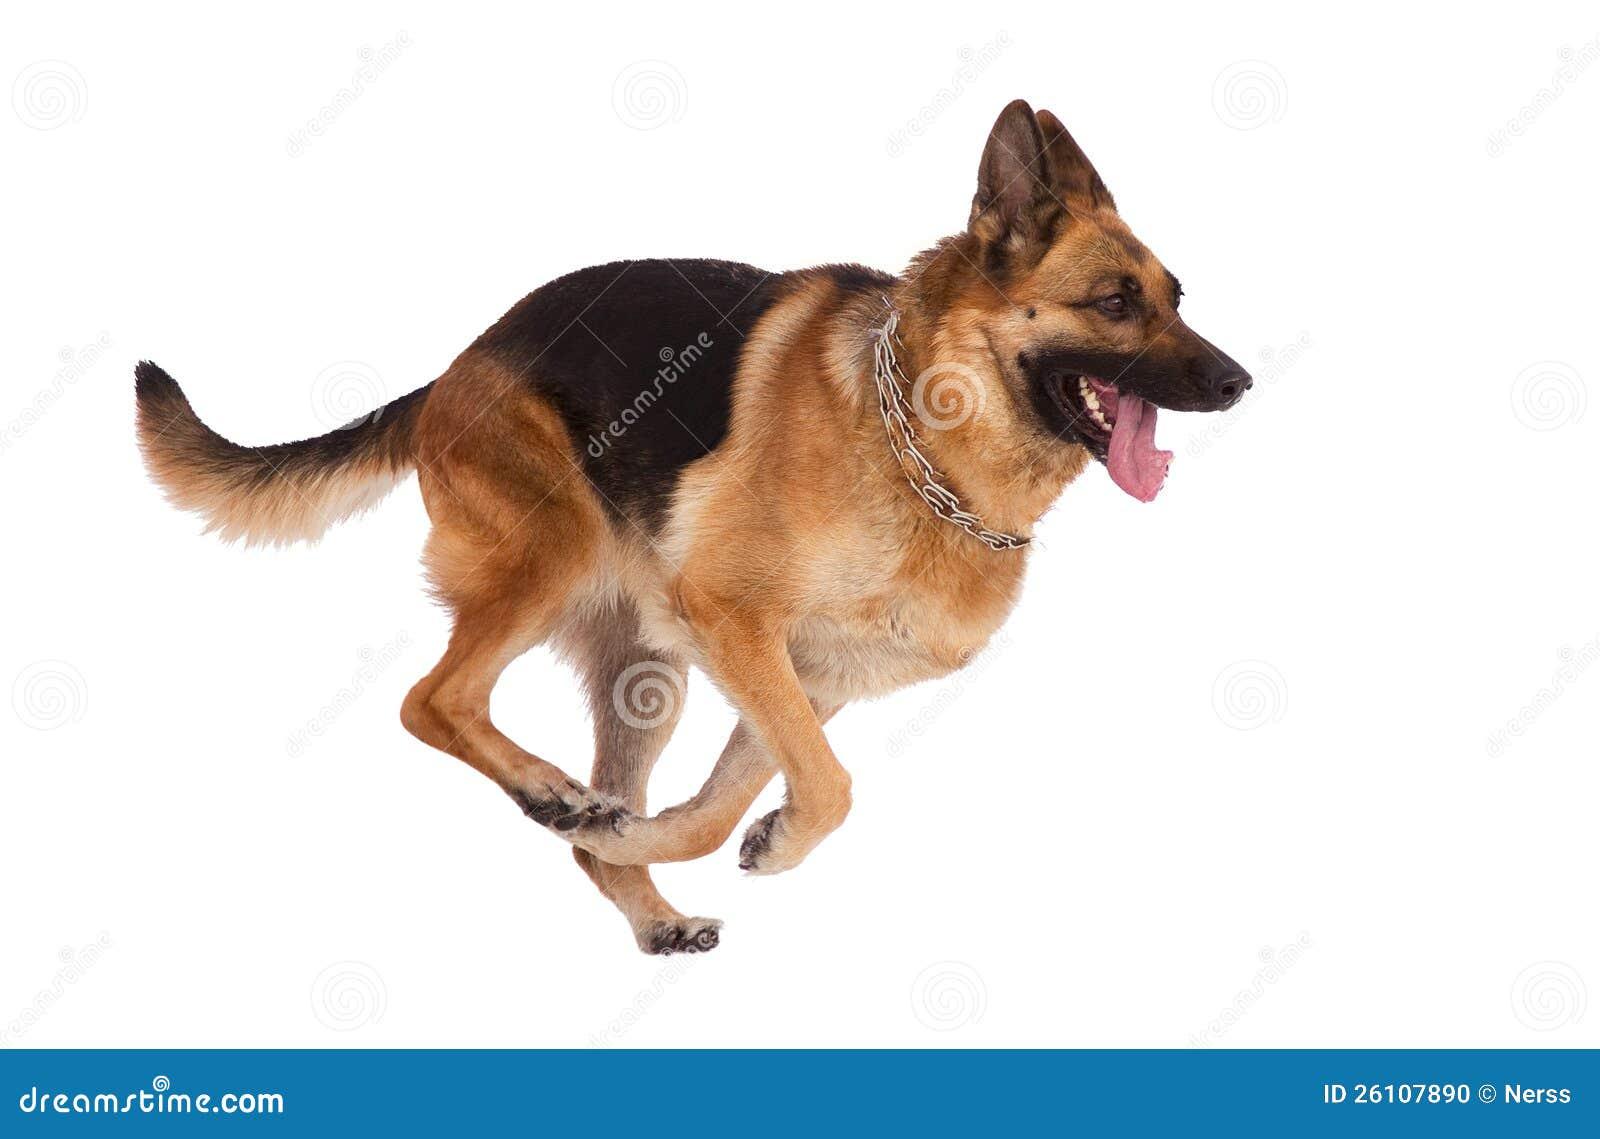 Audio Dogs Barking Free